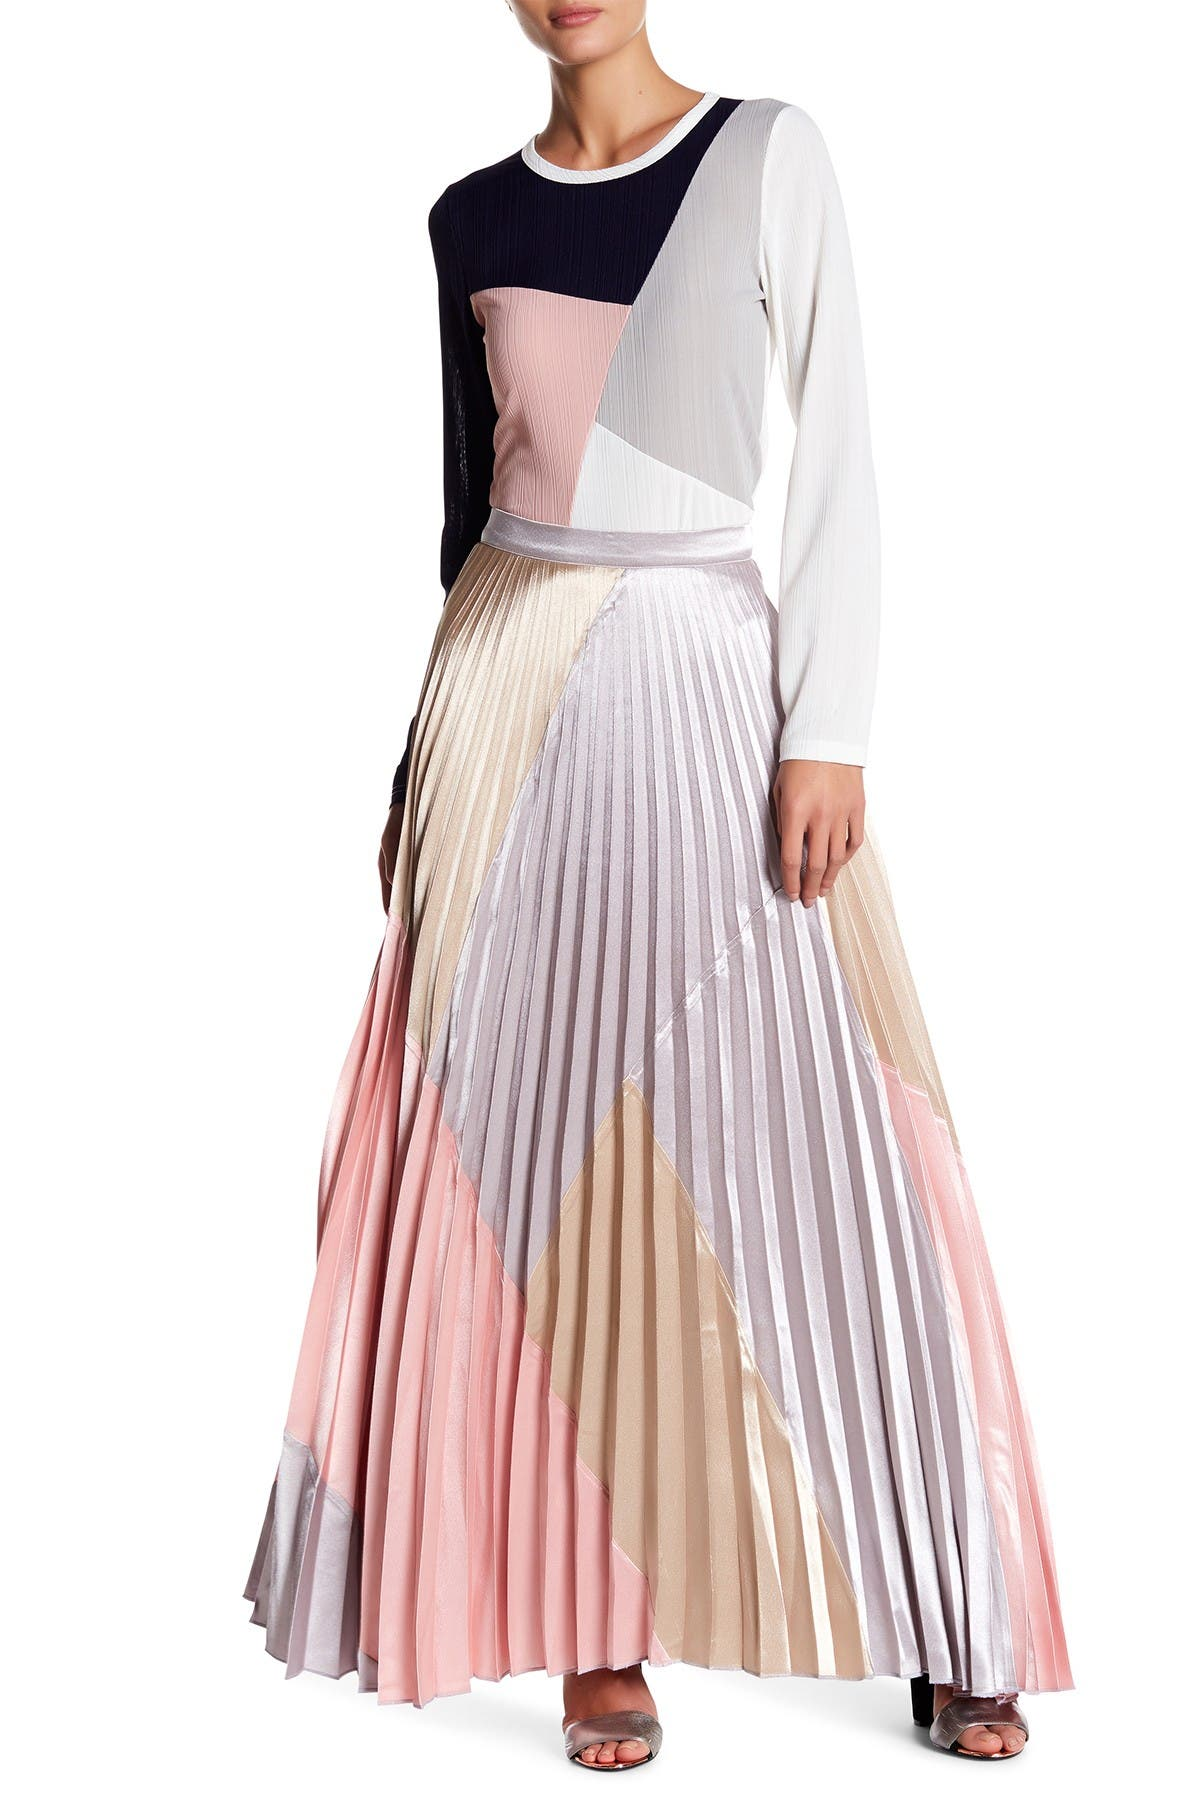 Image of Gracia Colorblock Pleated Maxi Skirt